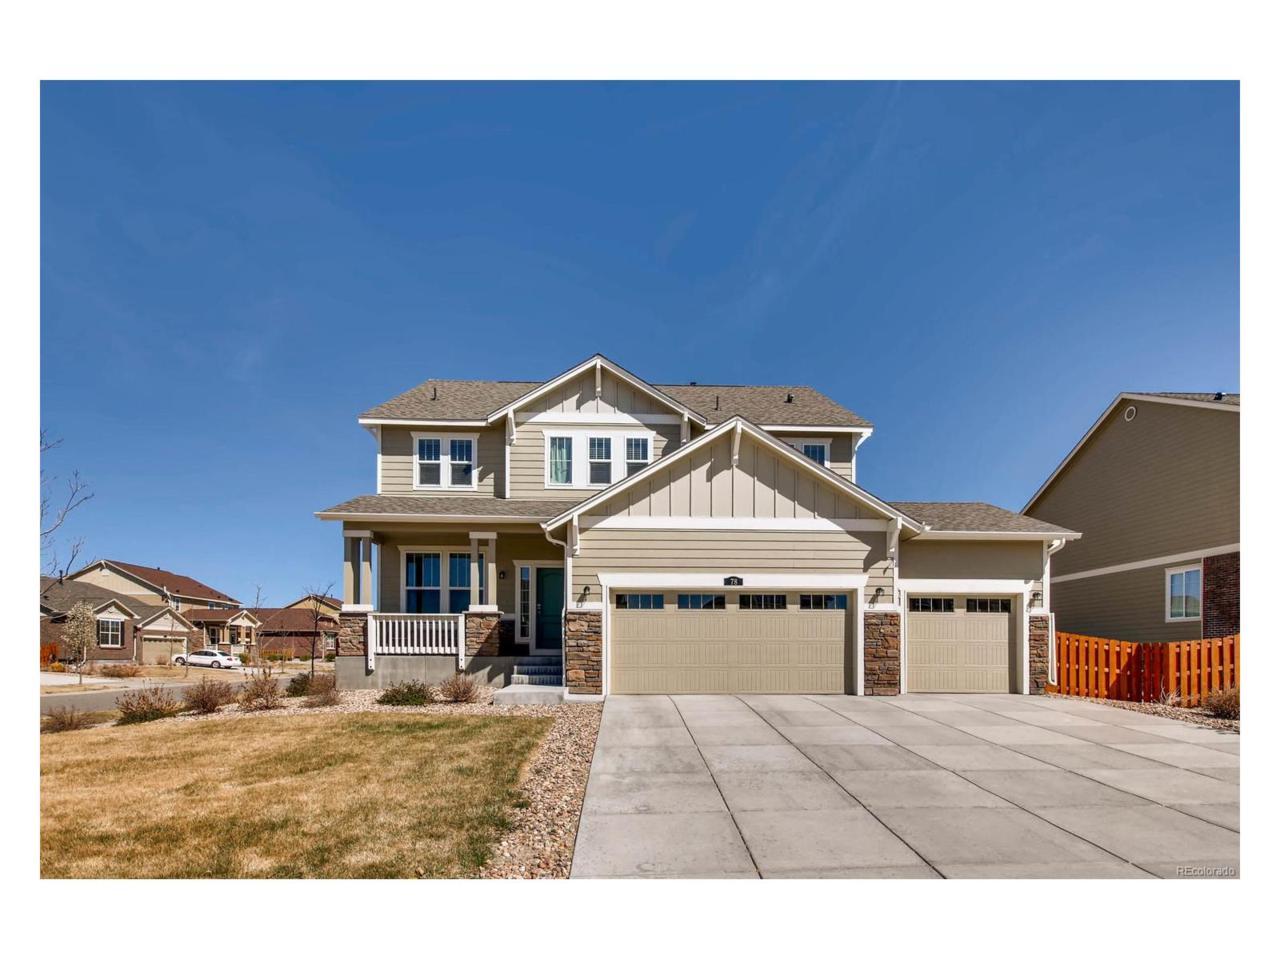 78 S Millbrook Street, Aurora, CO 80018 (MLS #4034052) :: 8z Real Estate